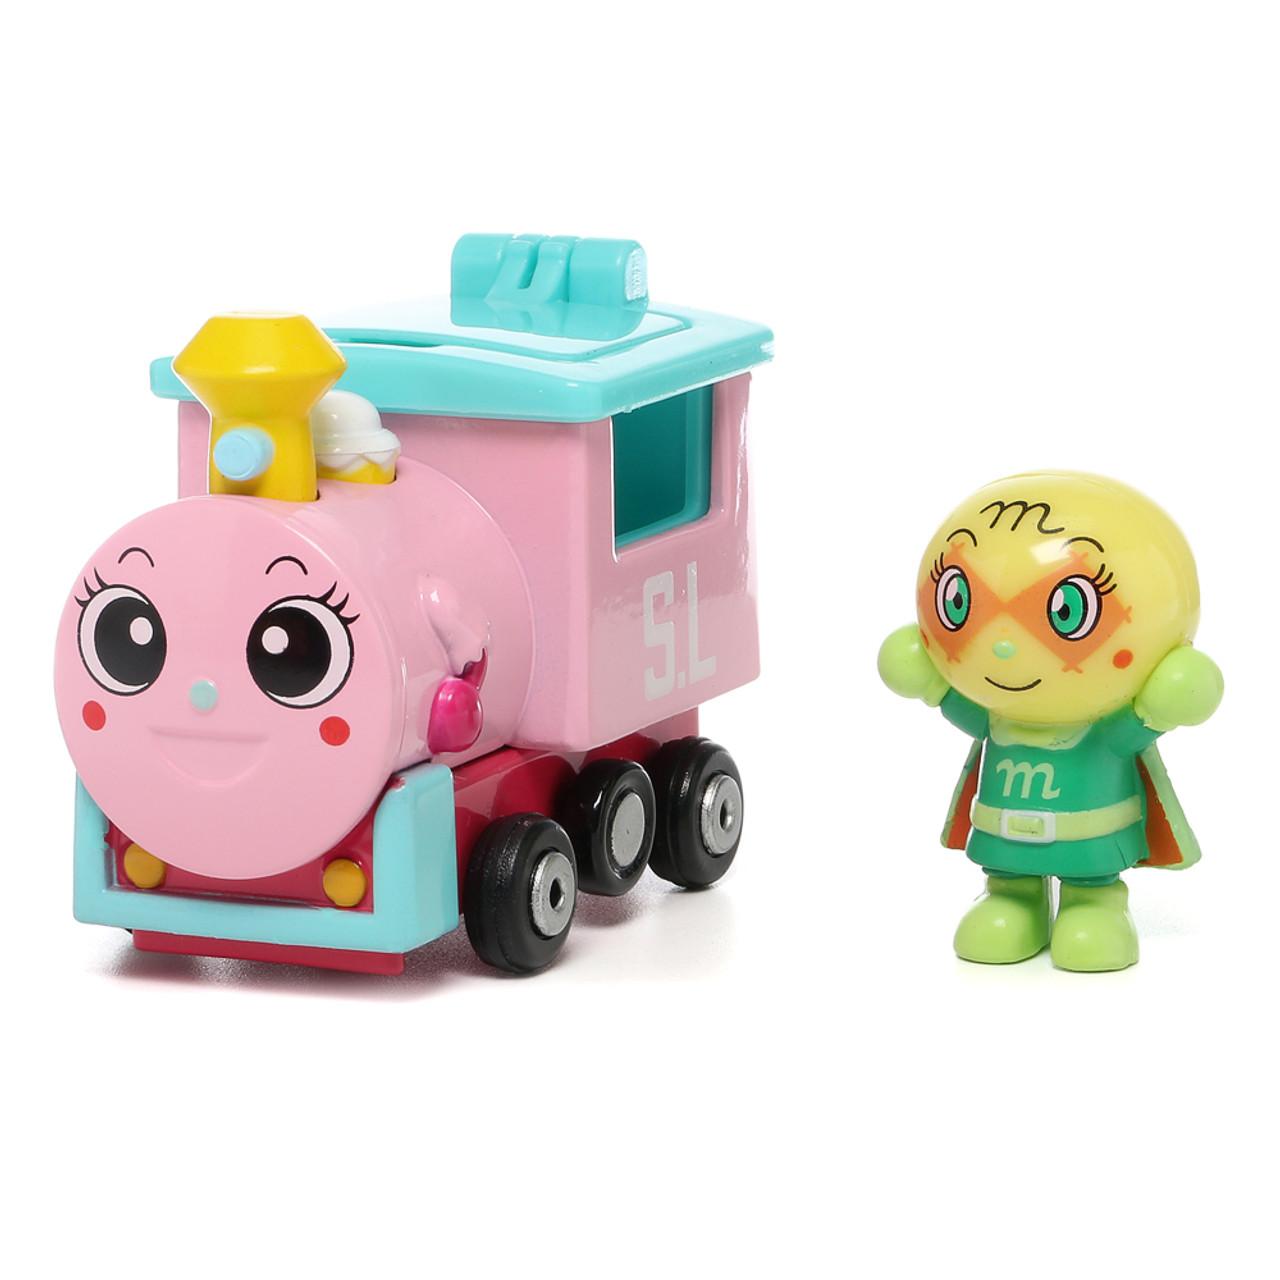 Sega Toys Anpanman Museum Go Go Mini Vehicle Carry Hero - Melonpanna Poppo train ( Melonpanna Poppo Front )